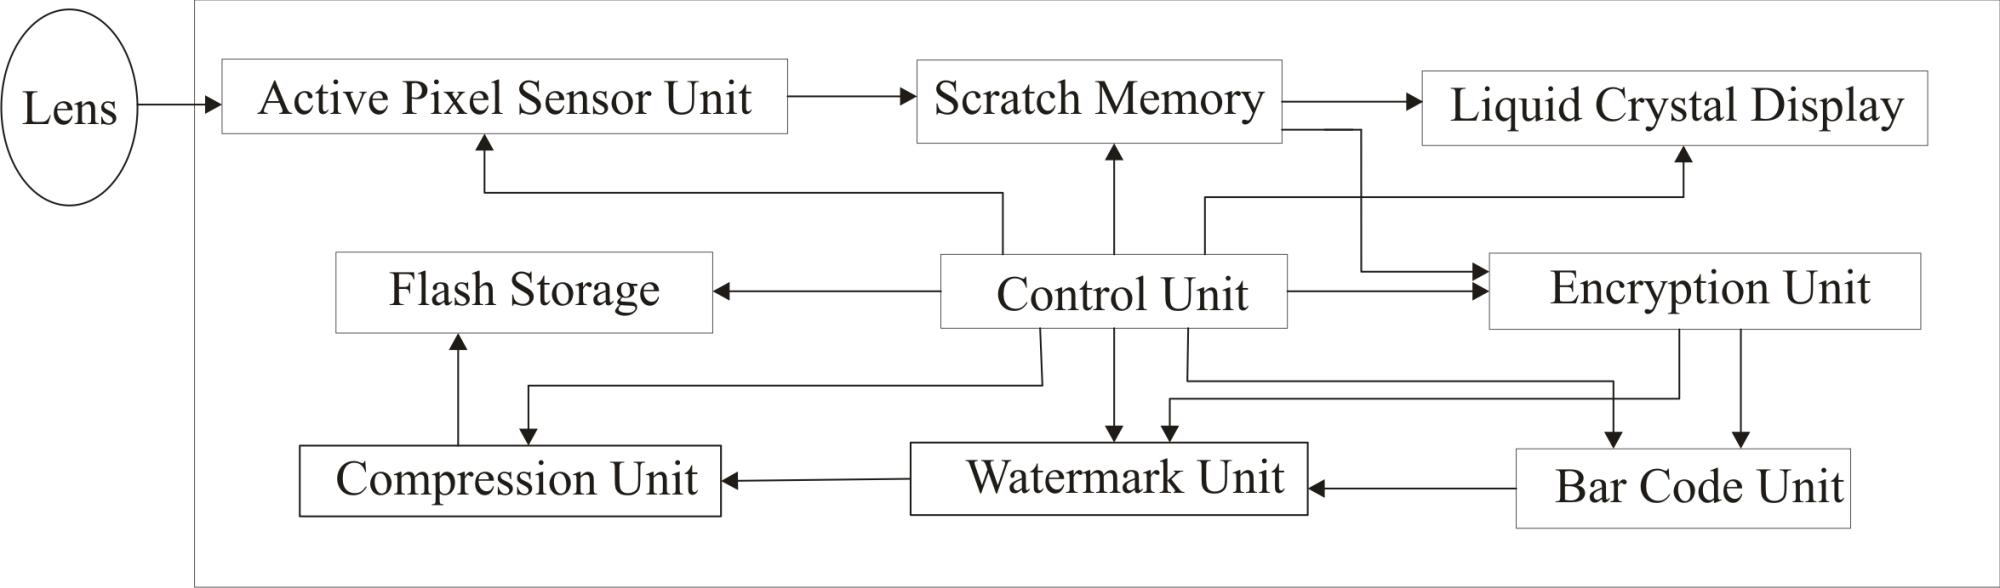 hight resolution of file secure digital cameral block diagram png